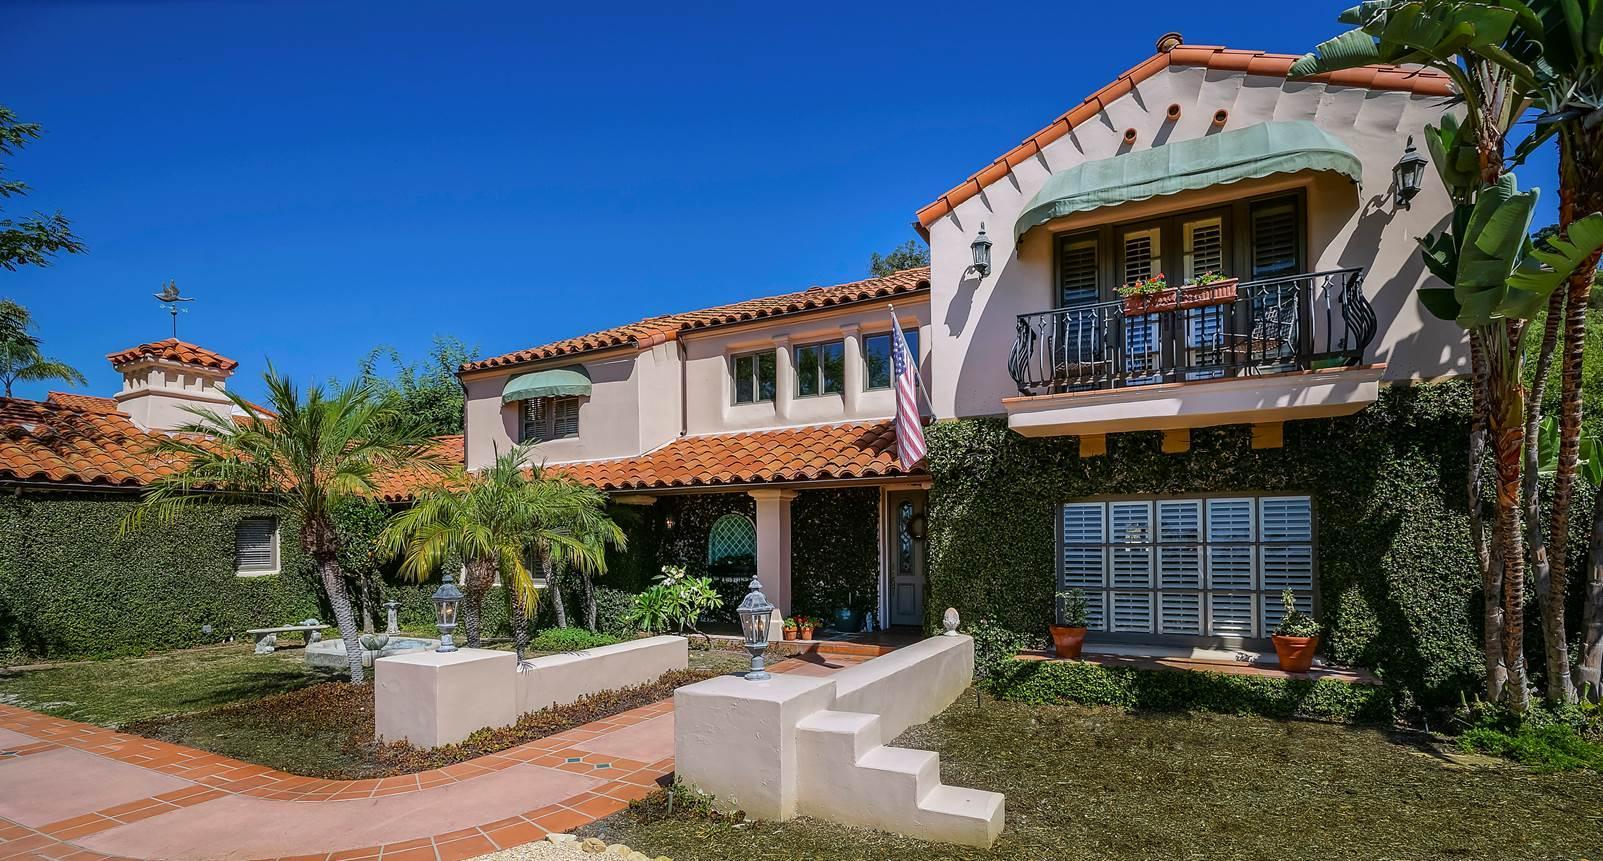 Property photo for 2220 Santiago Rd Santa Barbara, California 93103 - 15-3284